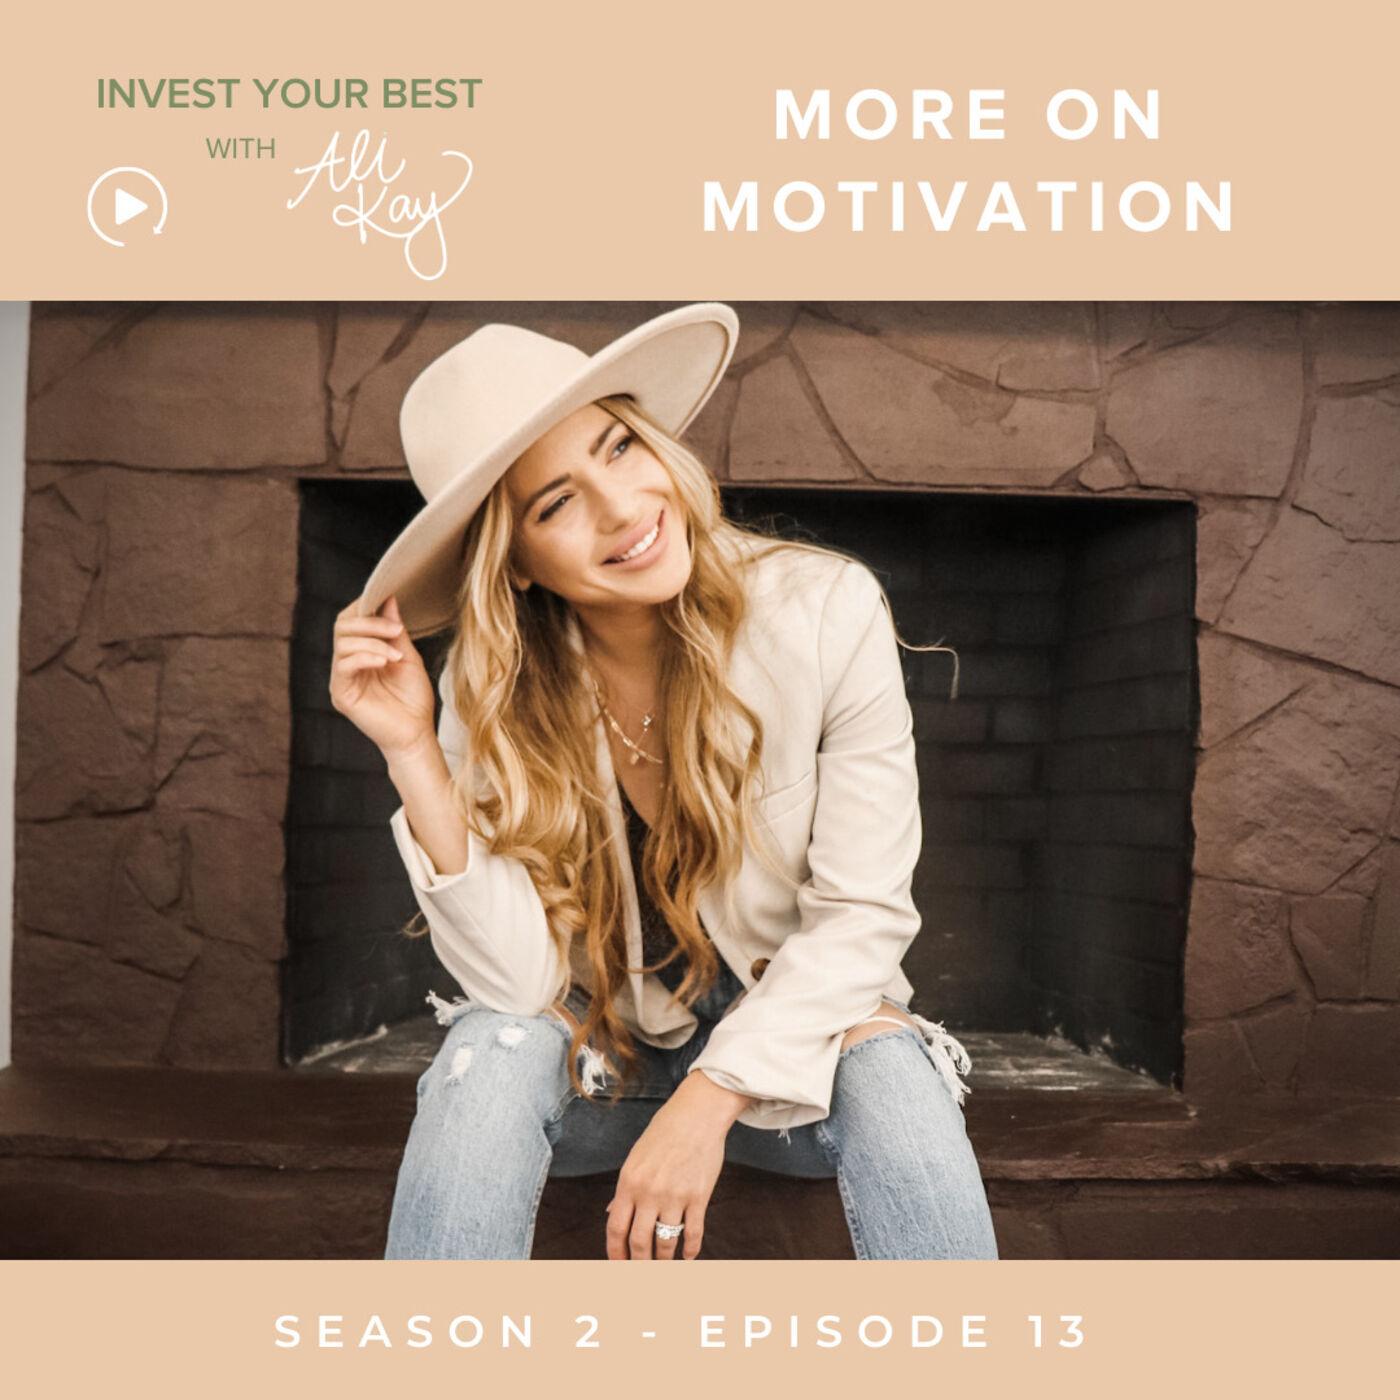 More On Motivation